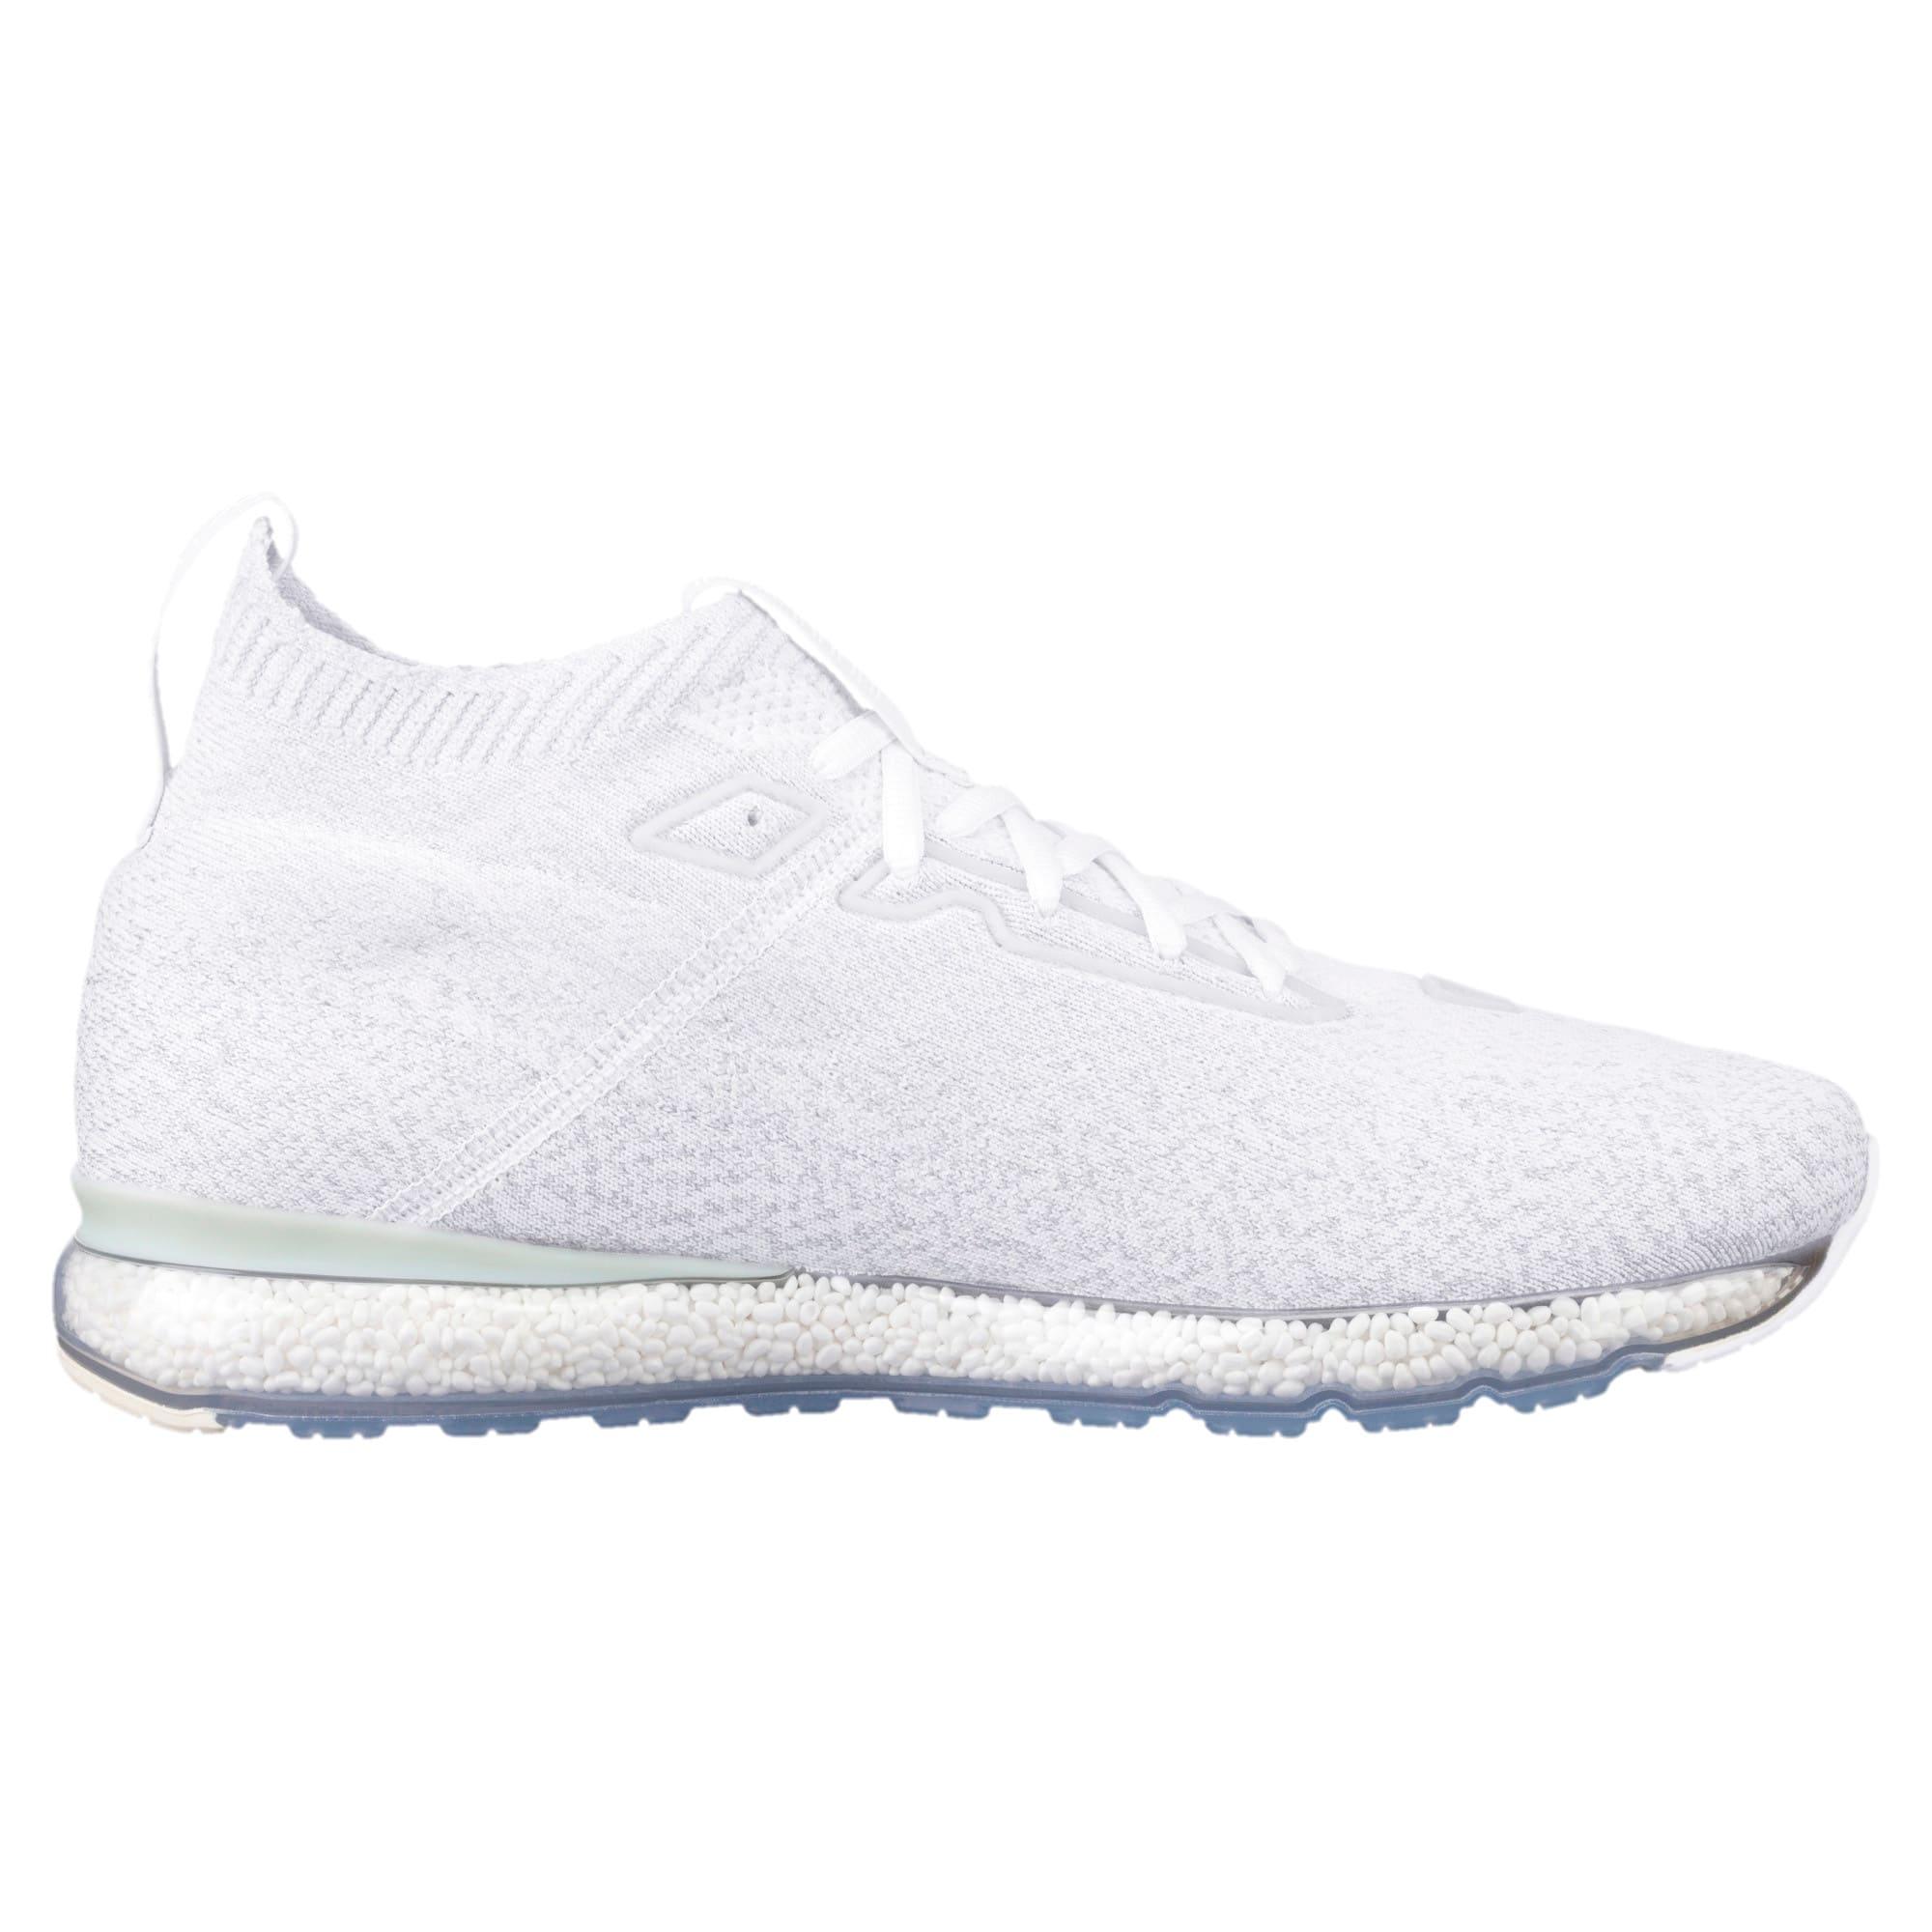 Thumbnail 3 of Jamming Men's Running Shoes, Puma White-Puma White, medium